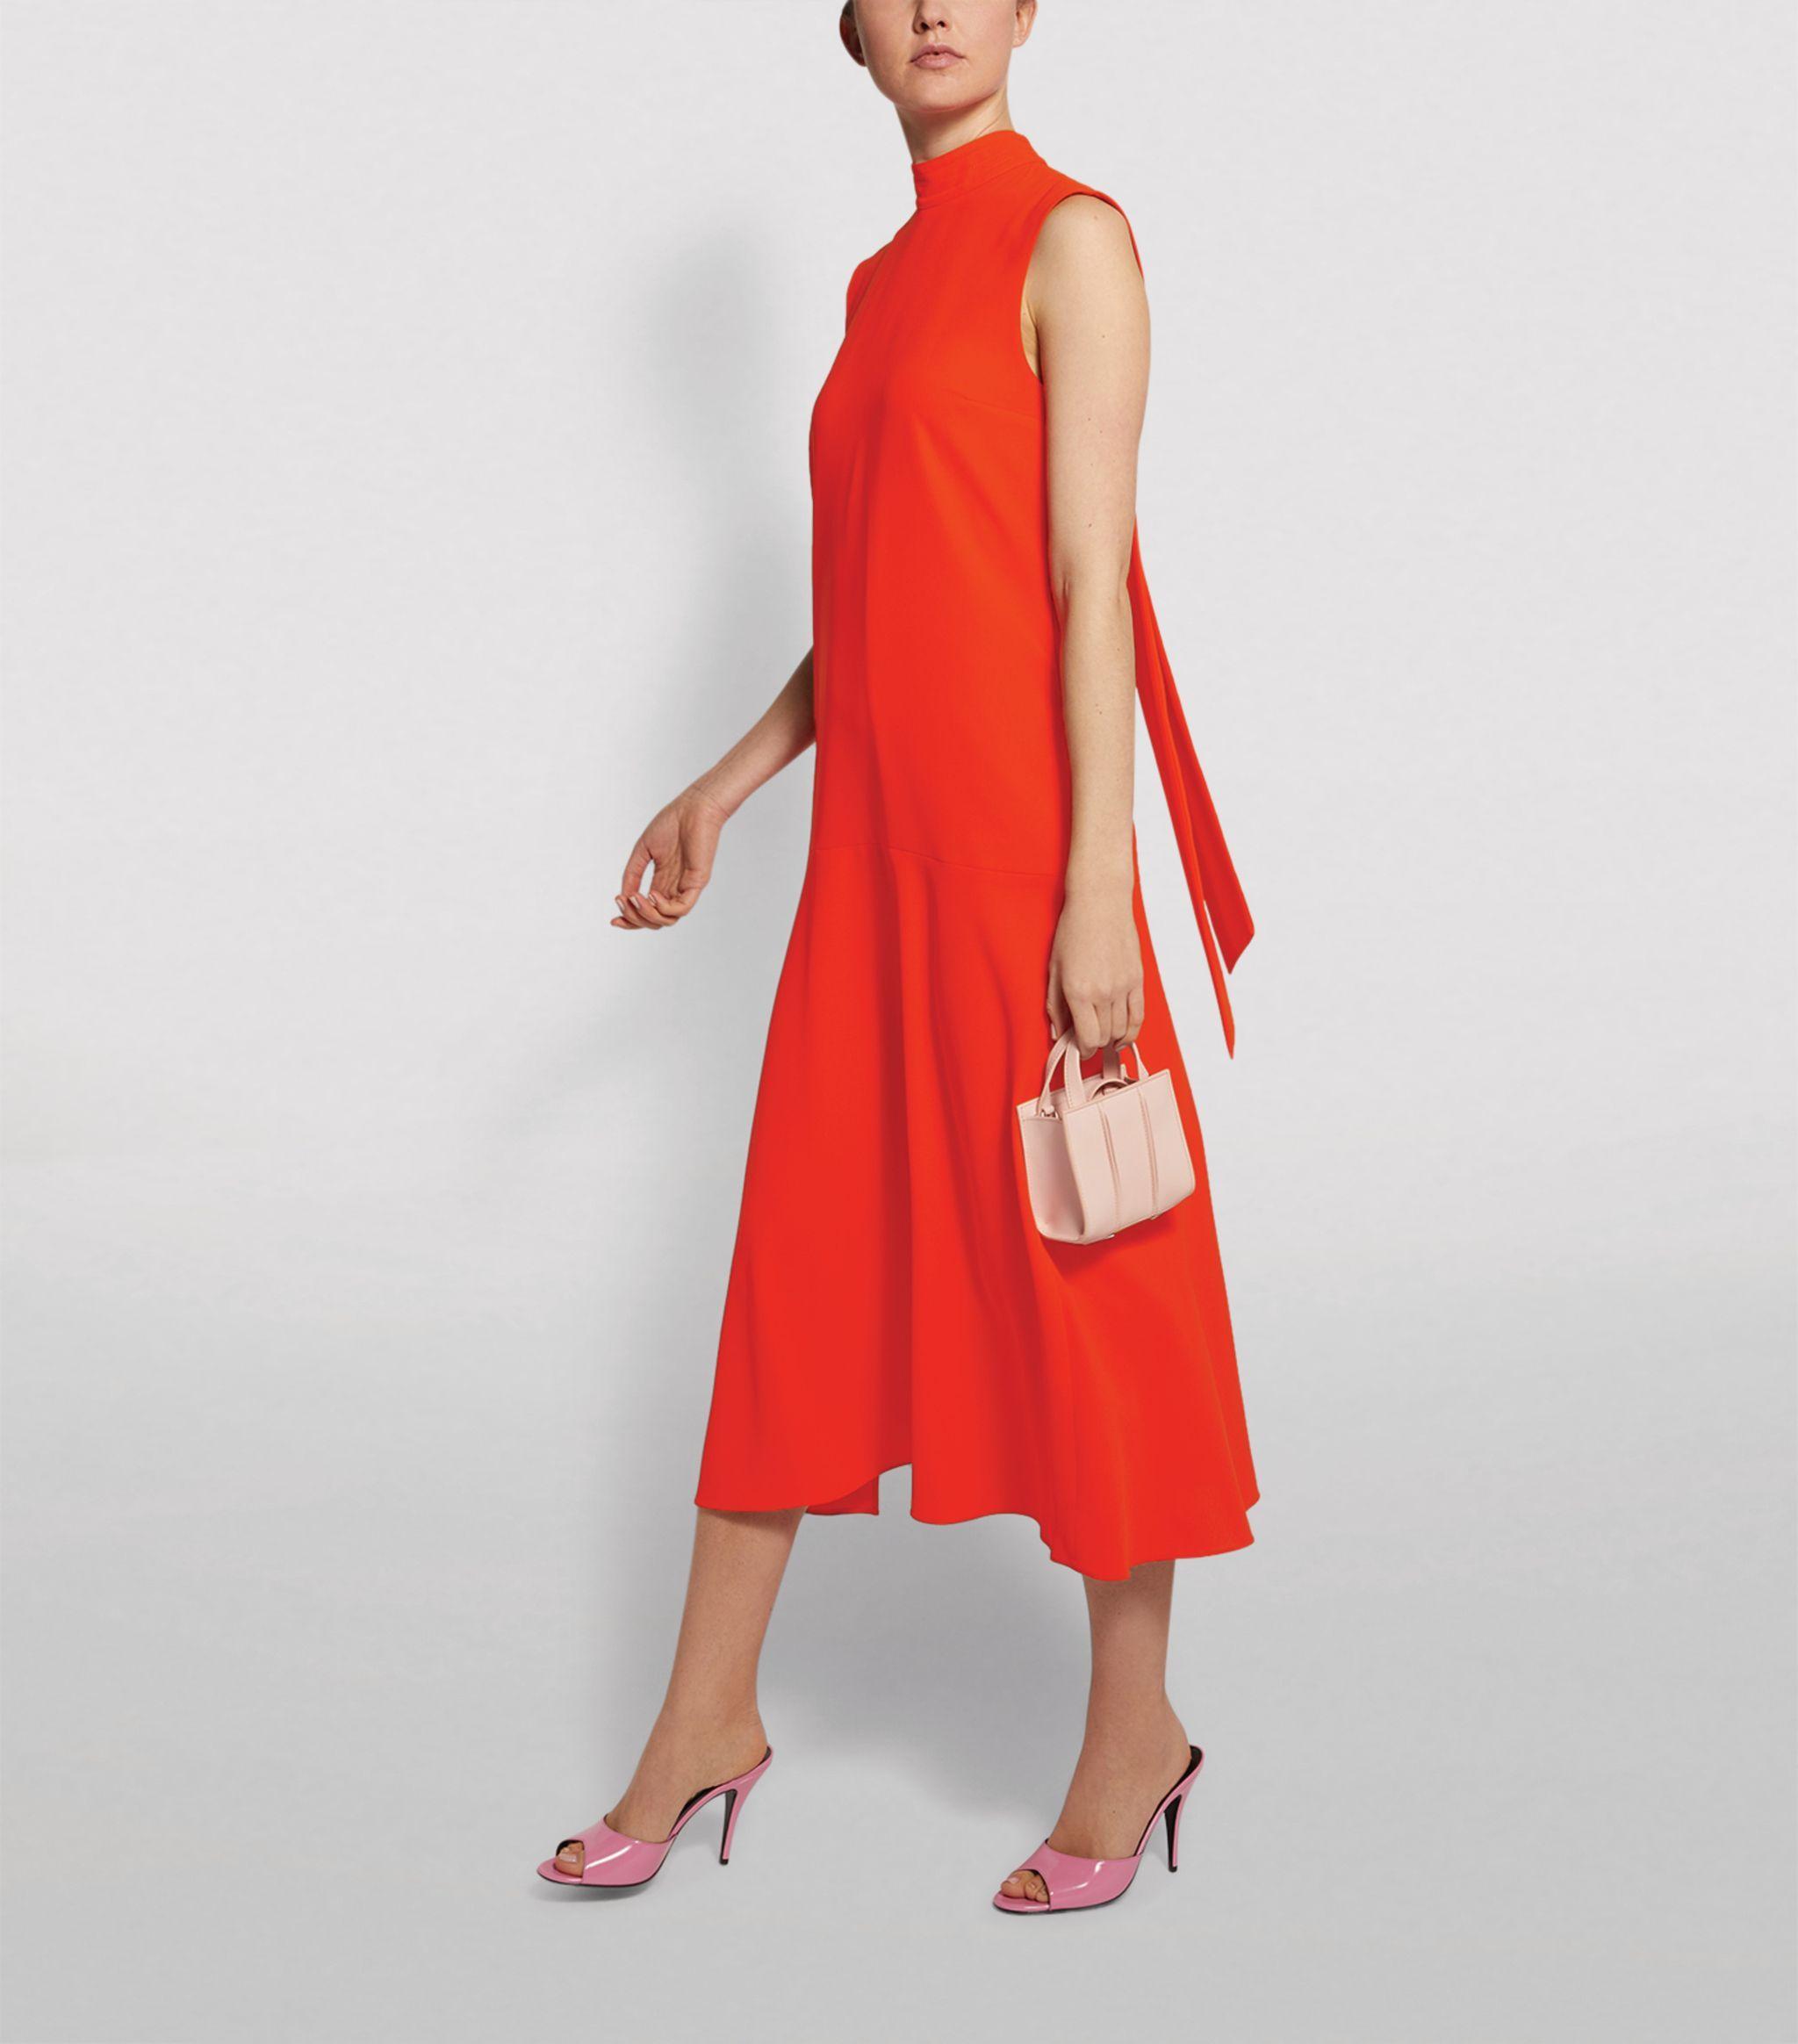 Victoria Beckham Red Sleeveless Midi Dress Harrods Com Midi Dress Sleeveless Midi Dress Dresses [ 2328 x 2048 Pixel ]